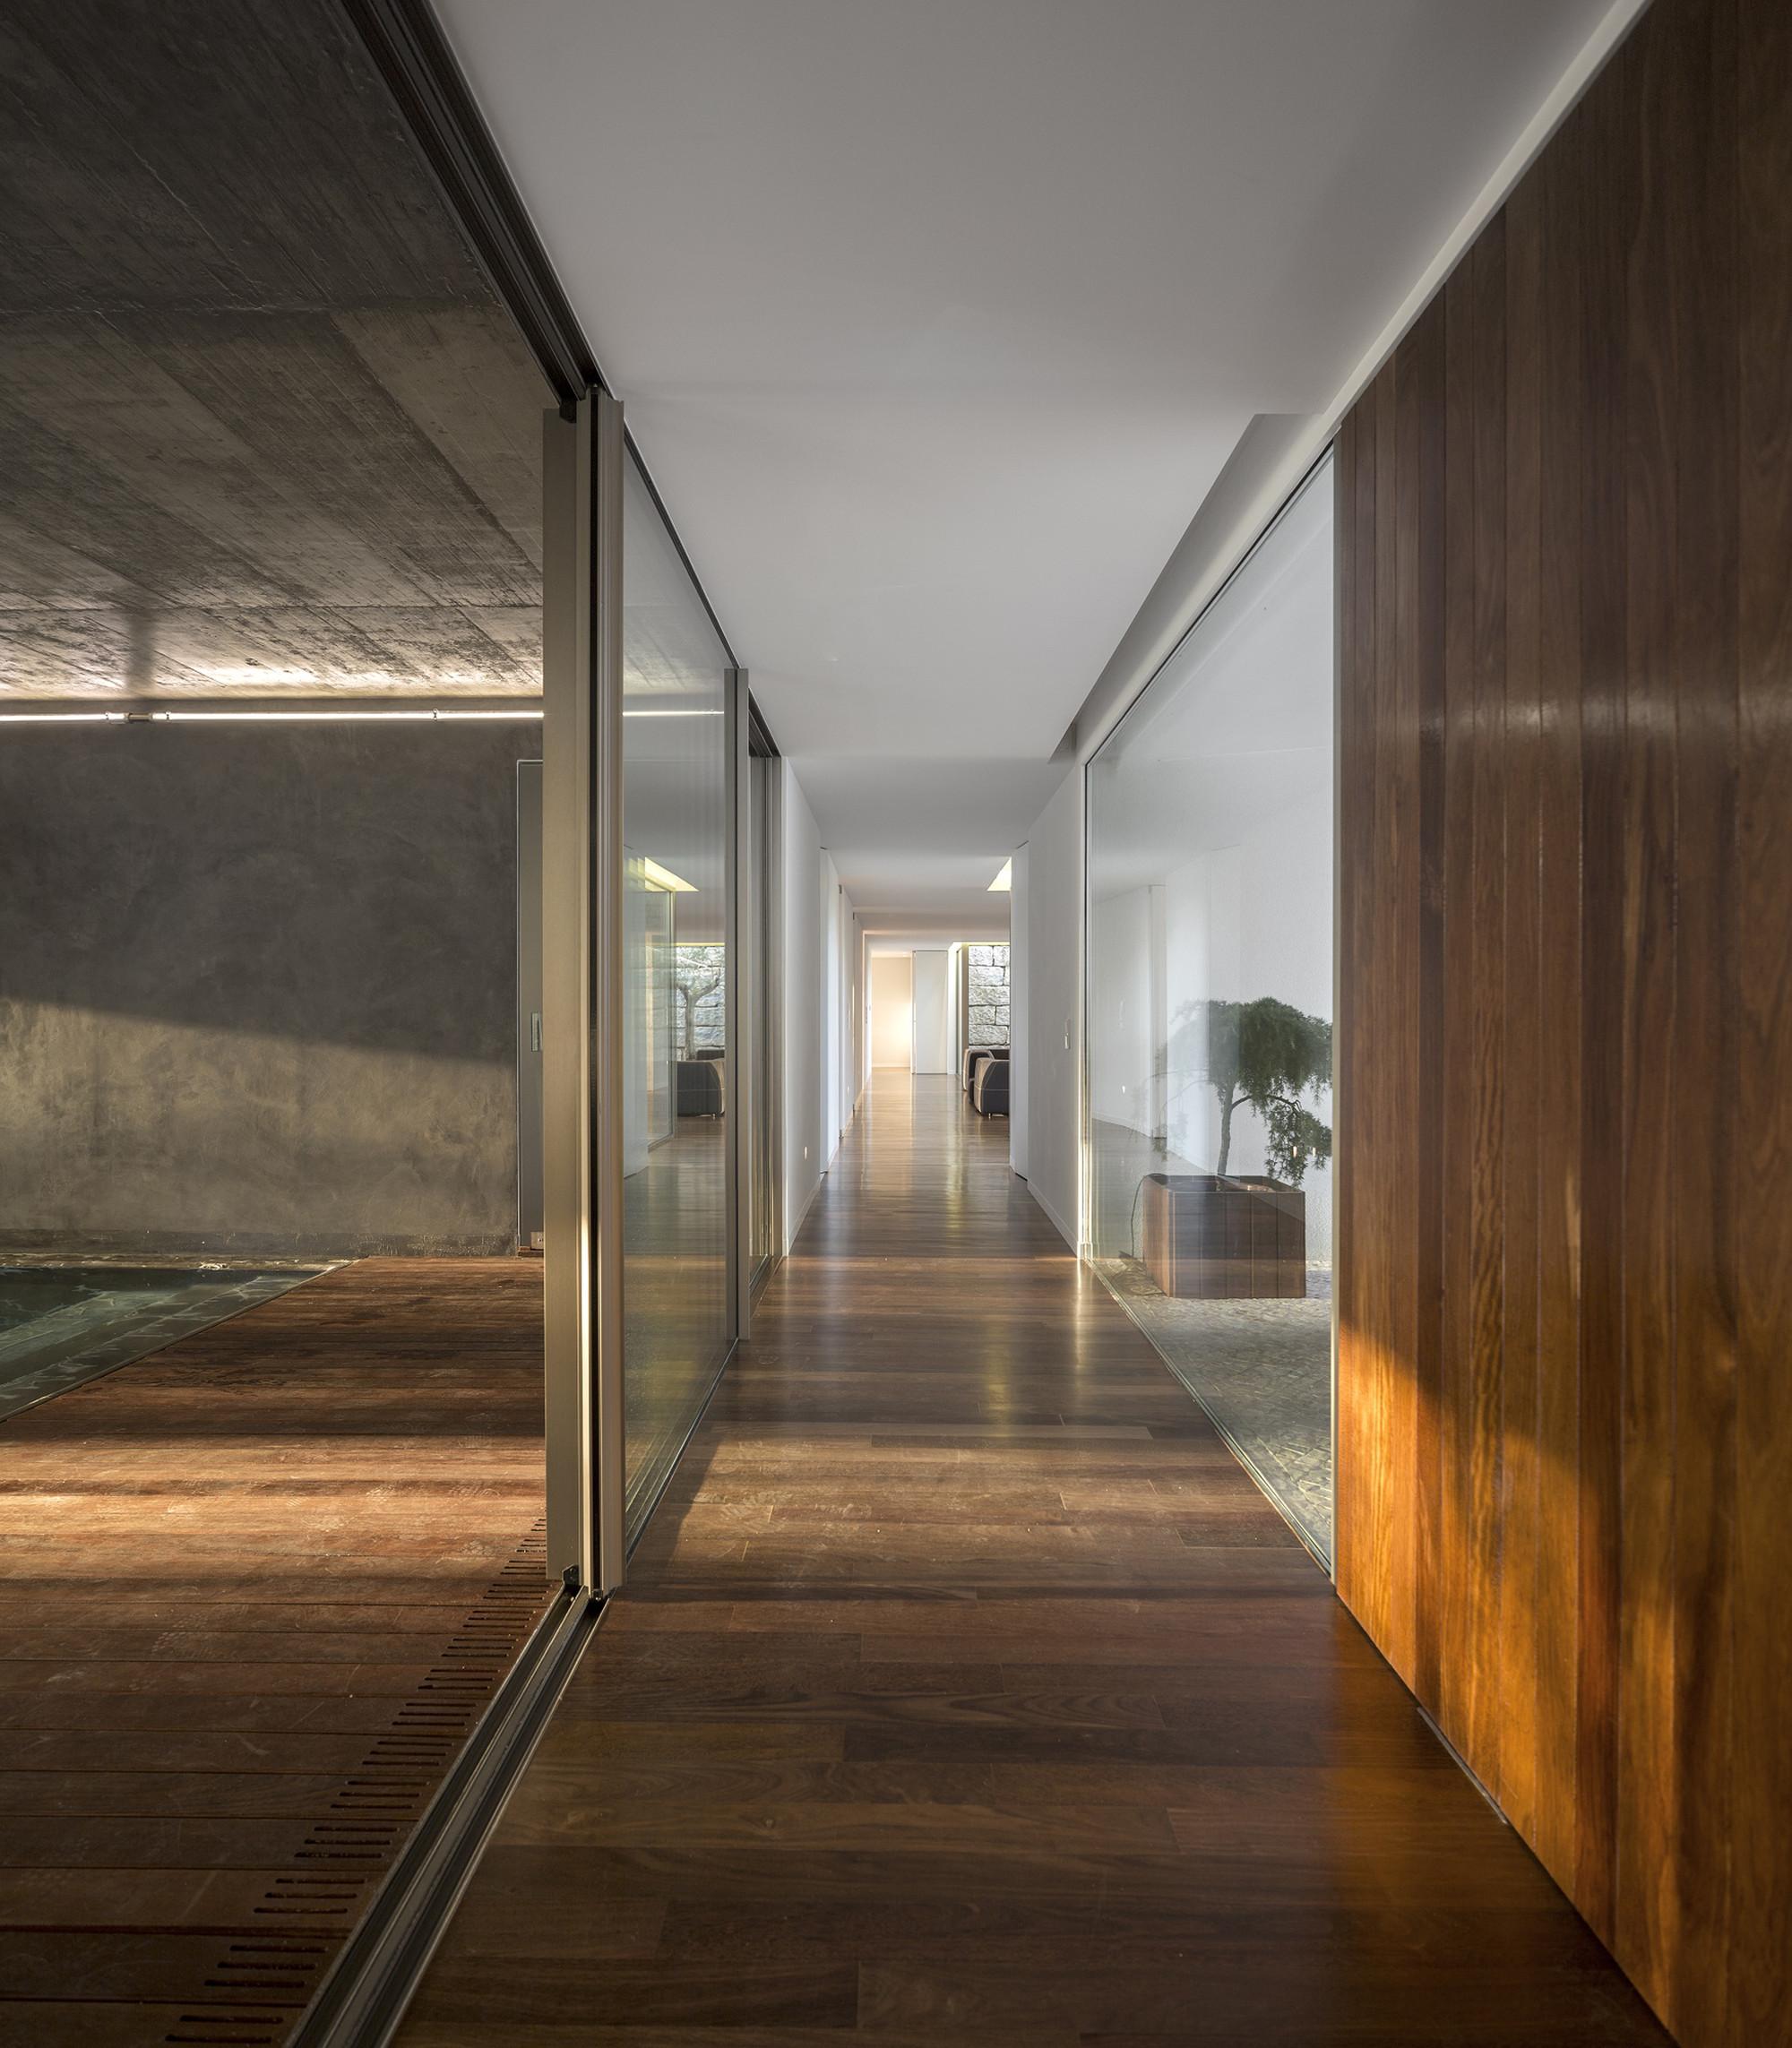 gallery of the hill cork house / contaminar arquitectos - 12